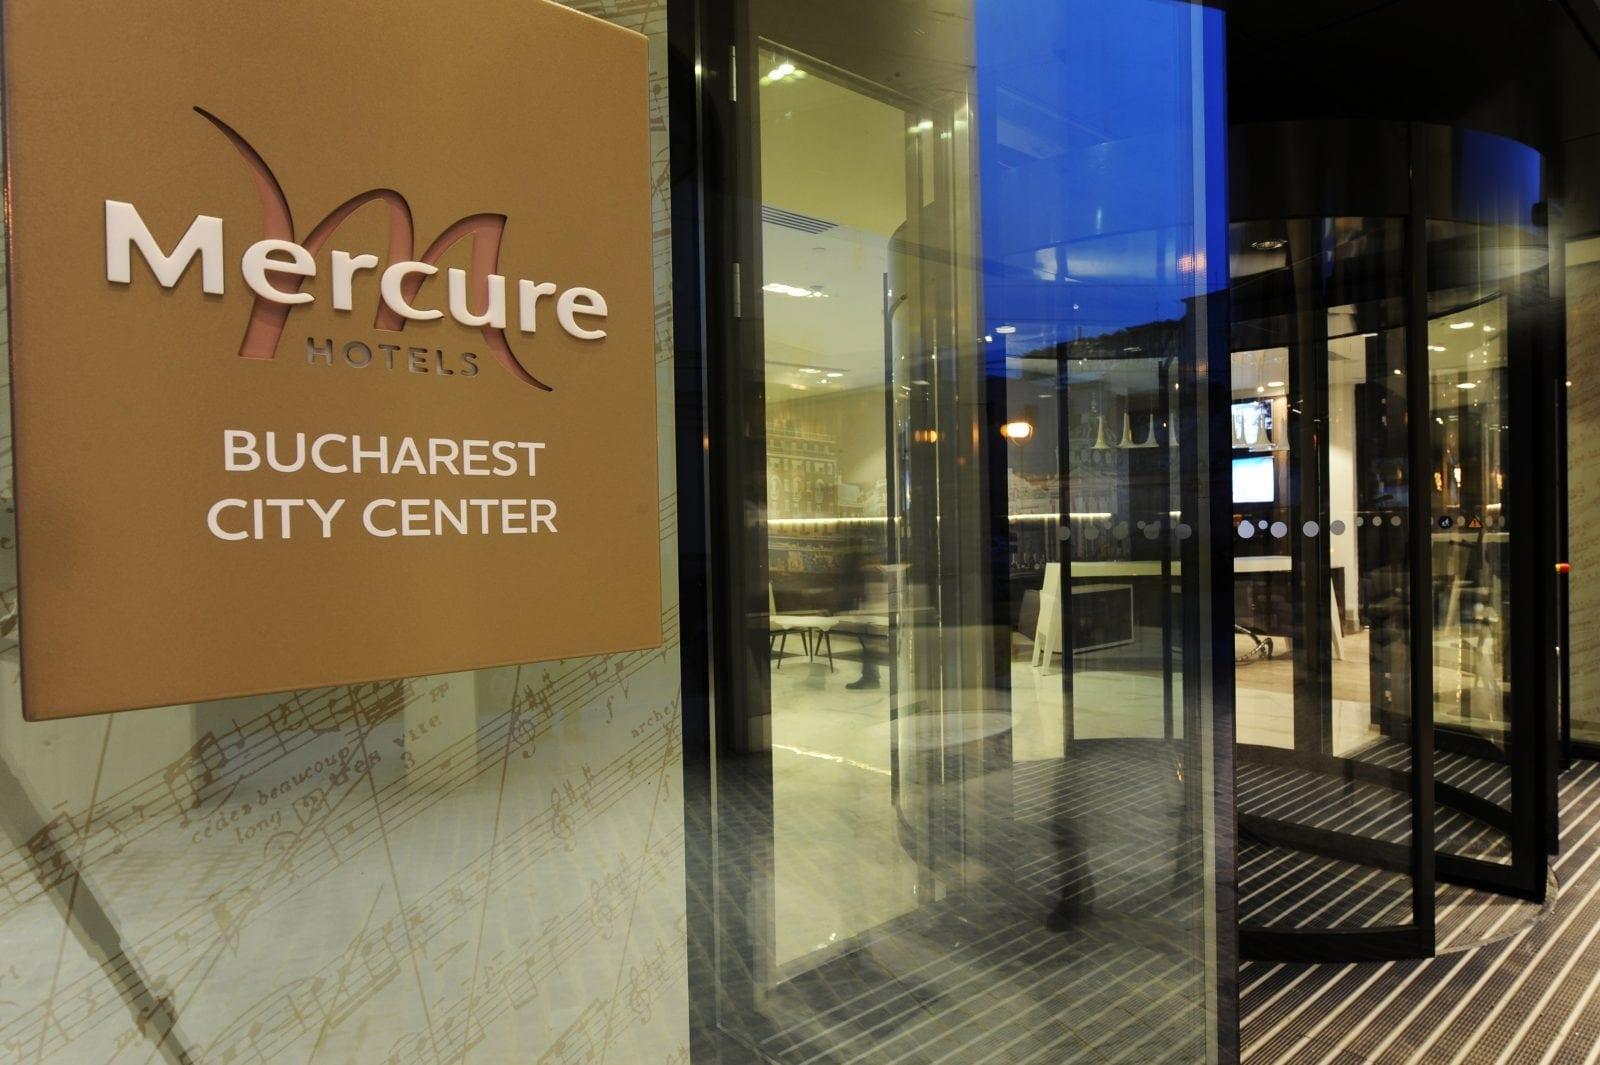 Mercure Bucharest City Center Entrance - S-a deschis primul hotel Mercure din România